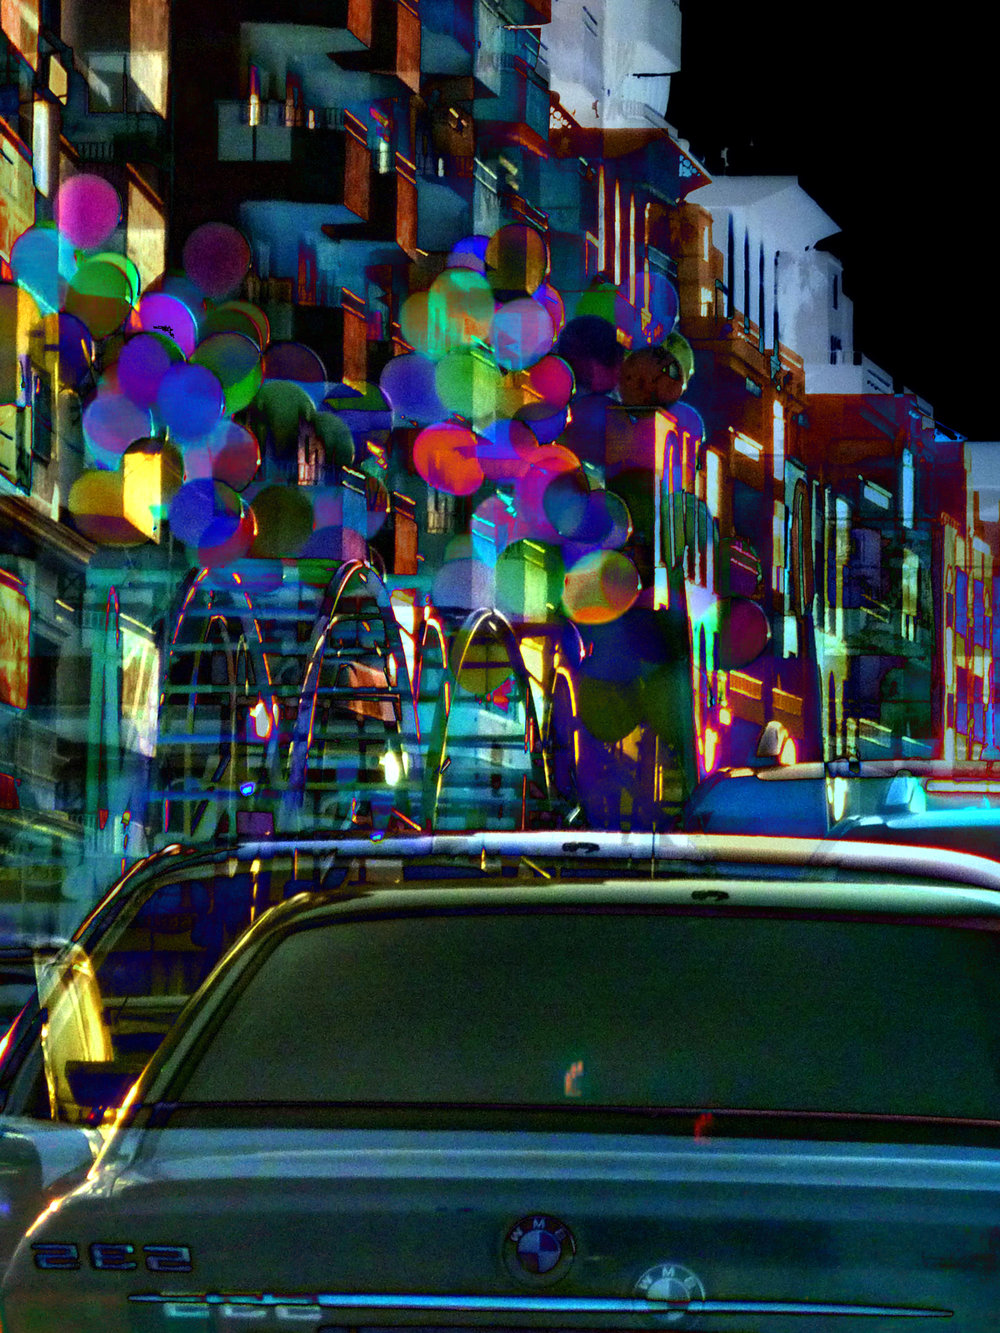 Setareh Shahbazi, Something Always Falls (Balloons), 4 x 11 inches, 2016